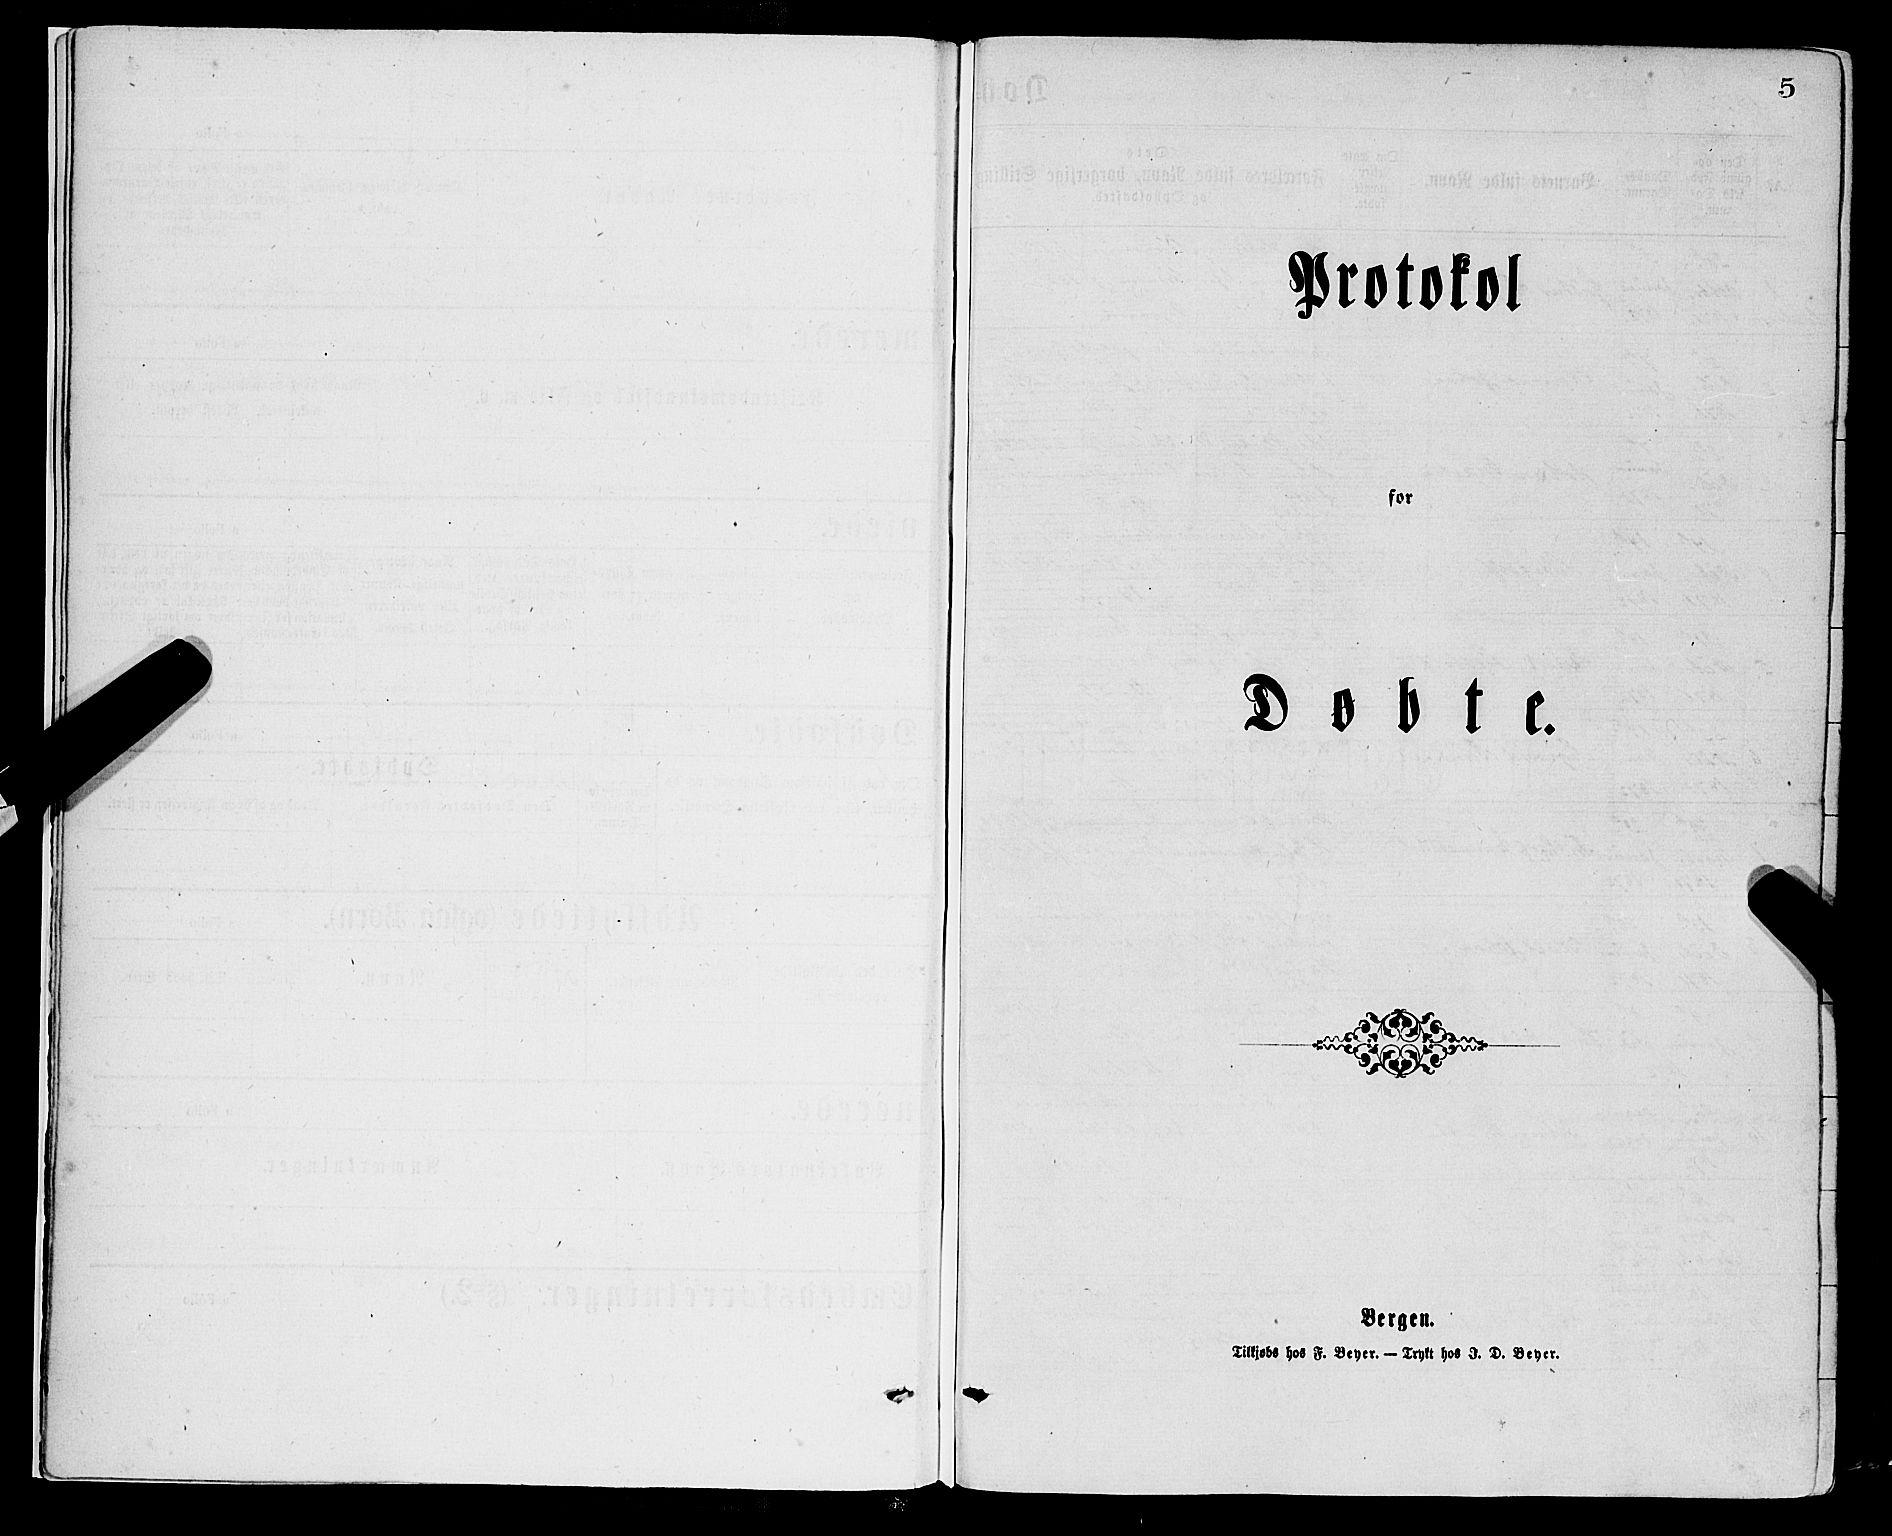 SAB, Domkirken sokneprestembete, H/Haa/L0022: Ministerialbok nr. B 5, 1872-1878, s. 4